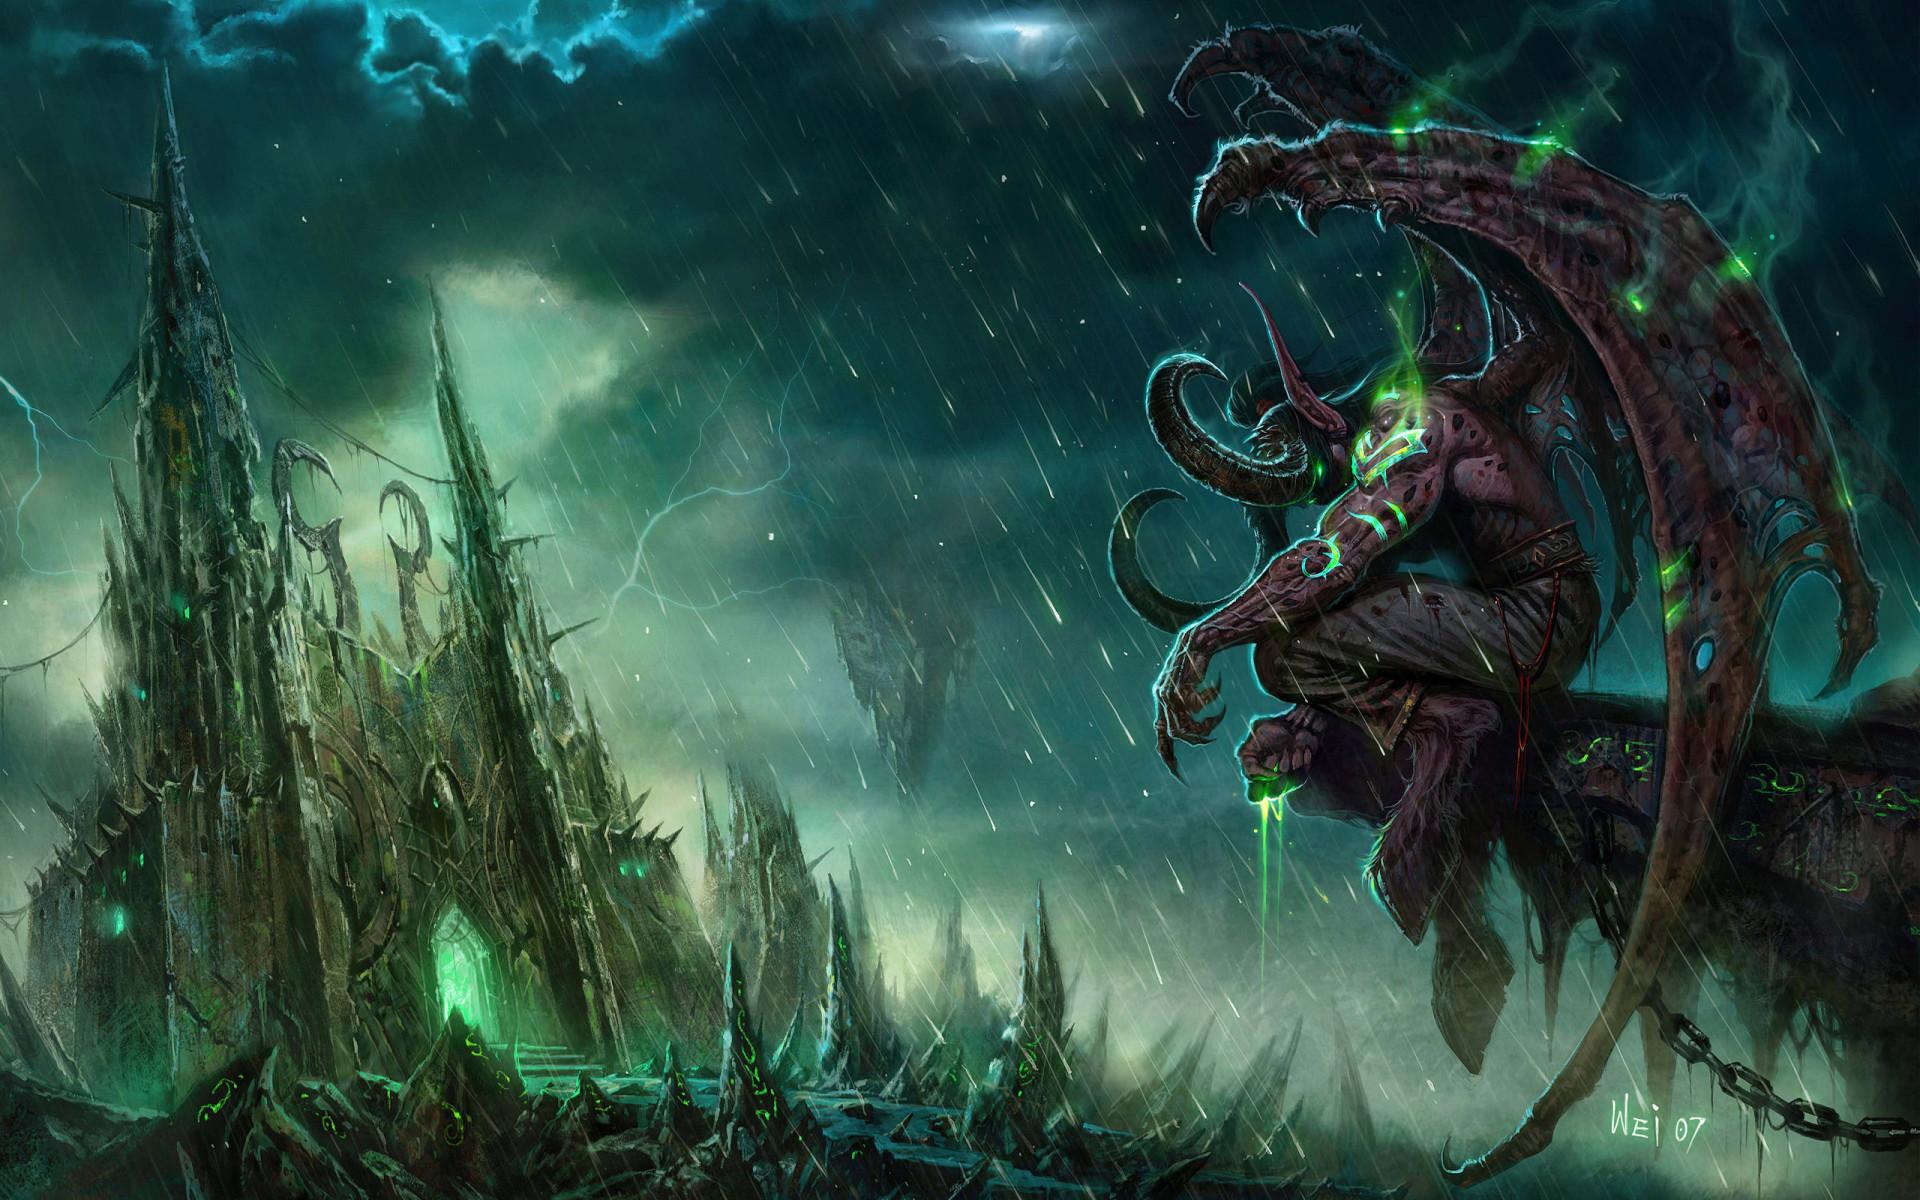 HD Fantasy Wallpapers 1080p